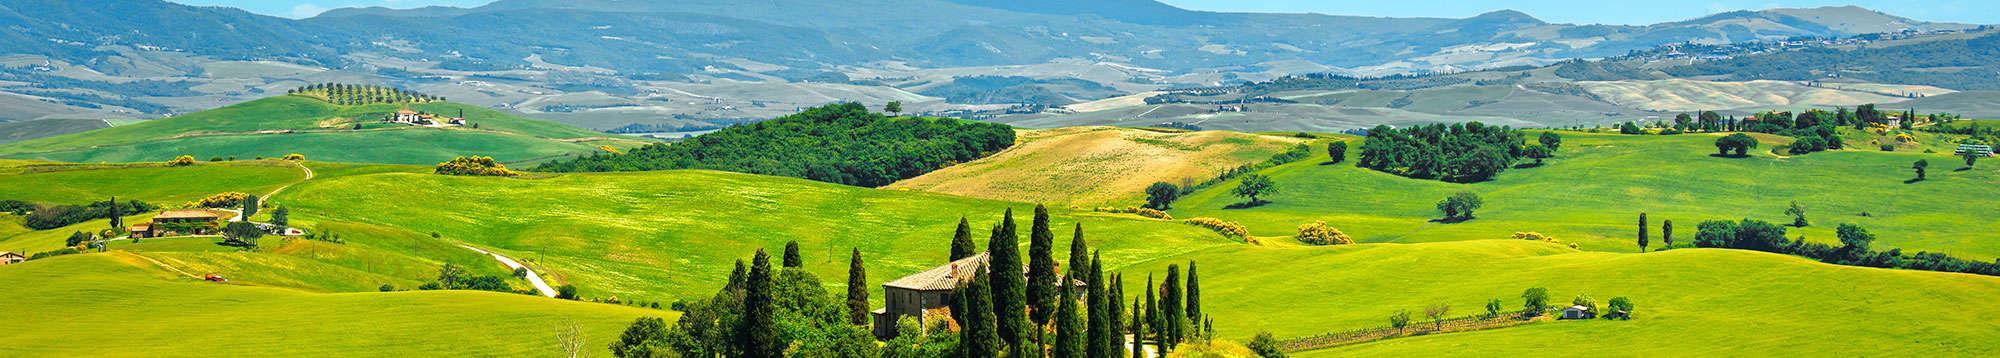 Week-end et séjour Toscane